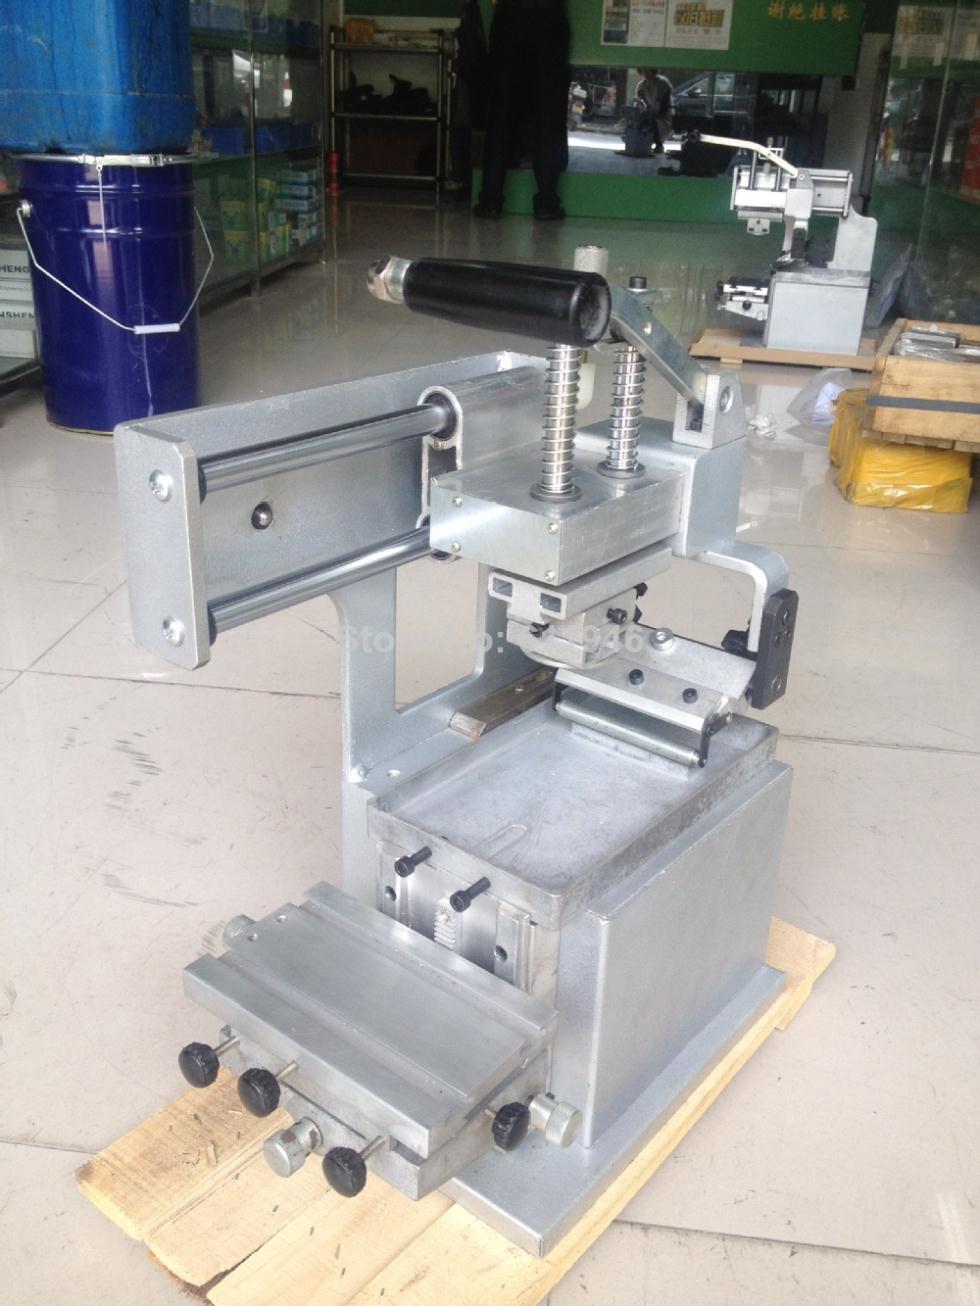 150 skok instrukcja maszyna do tampondruku druk atramentowy maszyna instrukcja maszyna kodująca JYS100-150